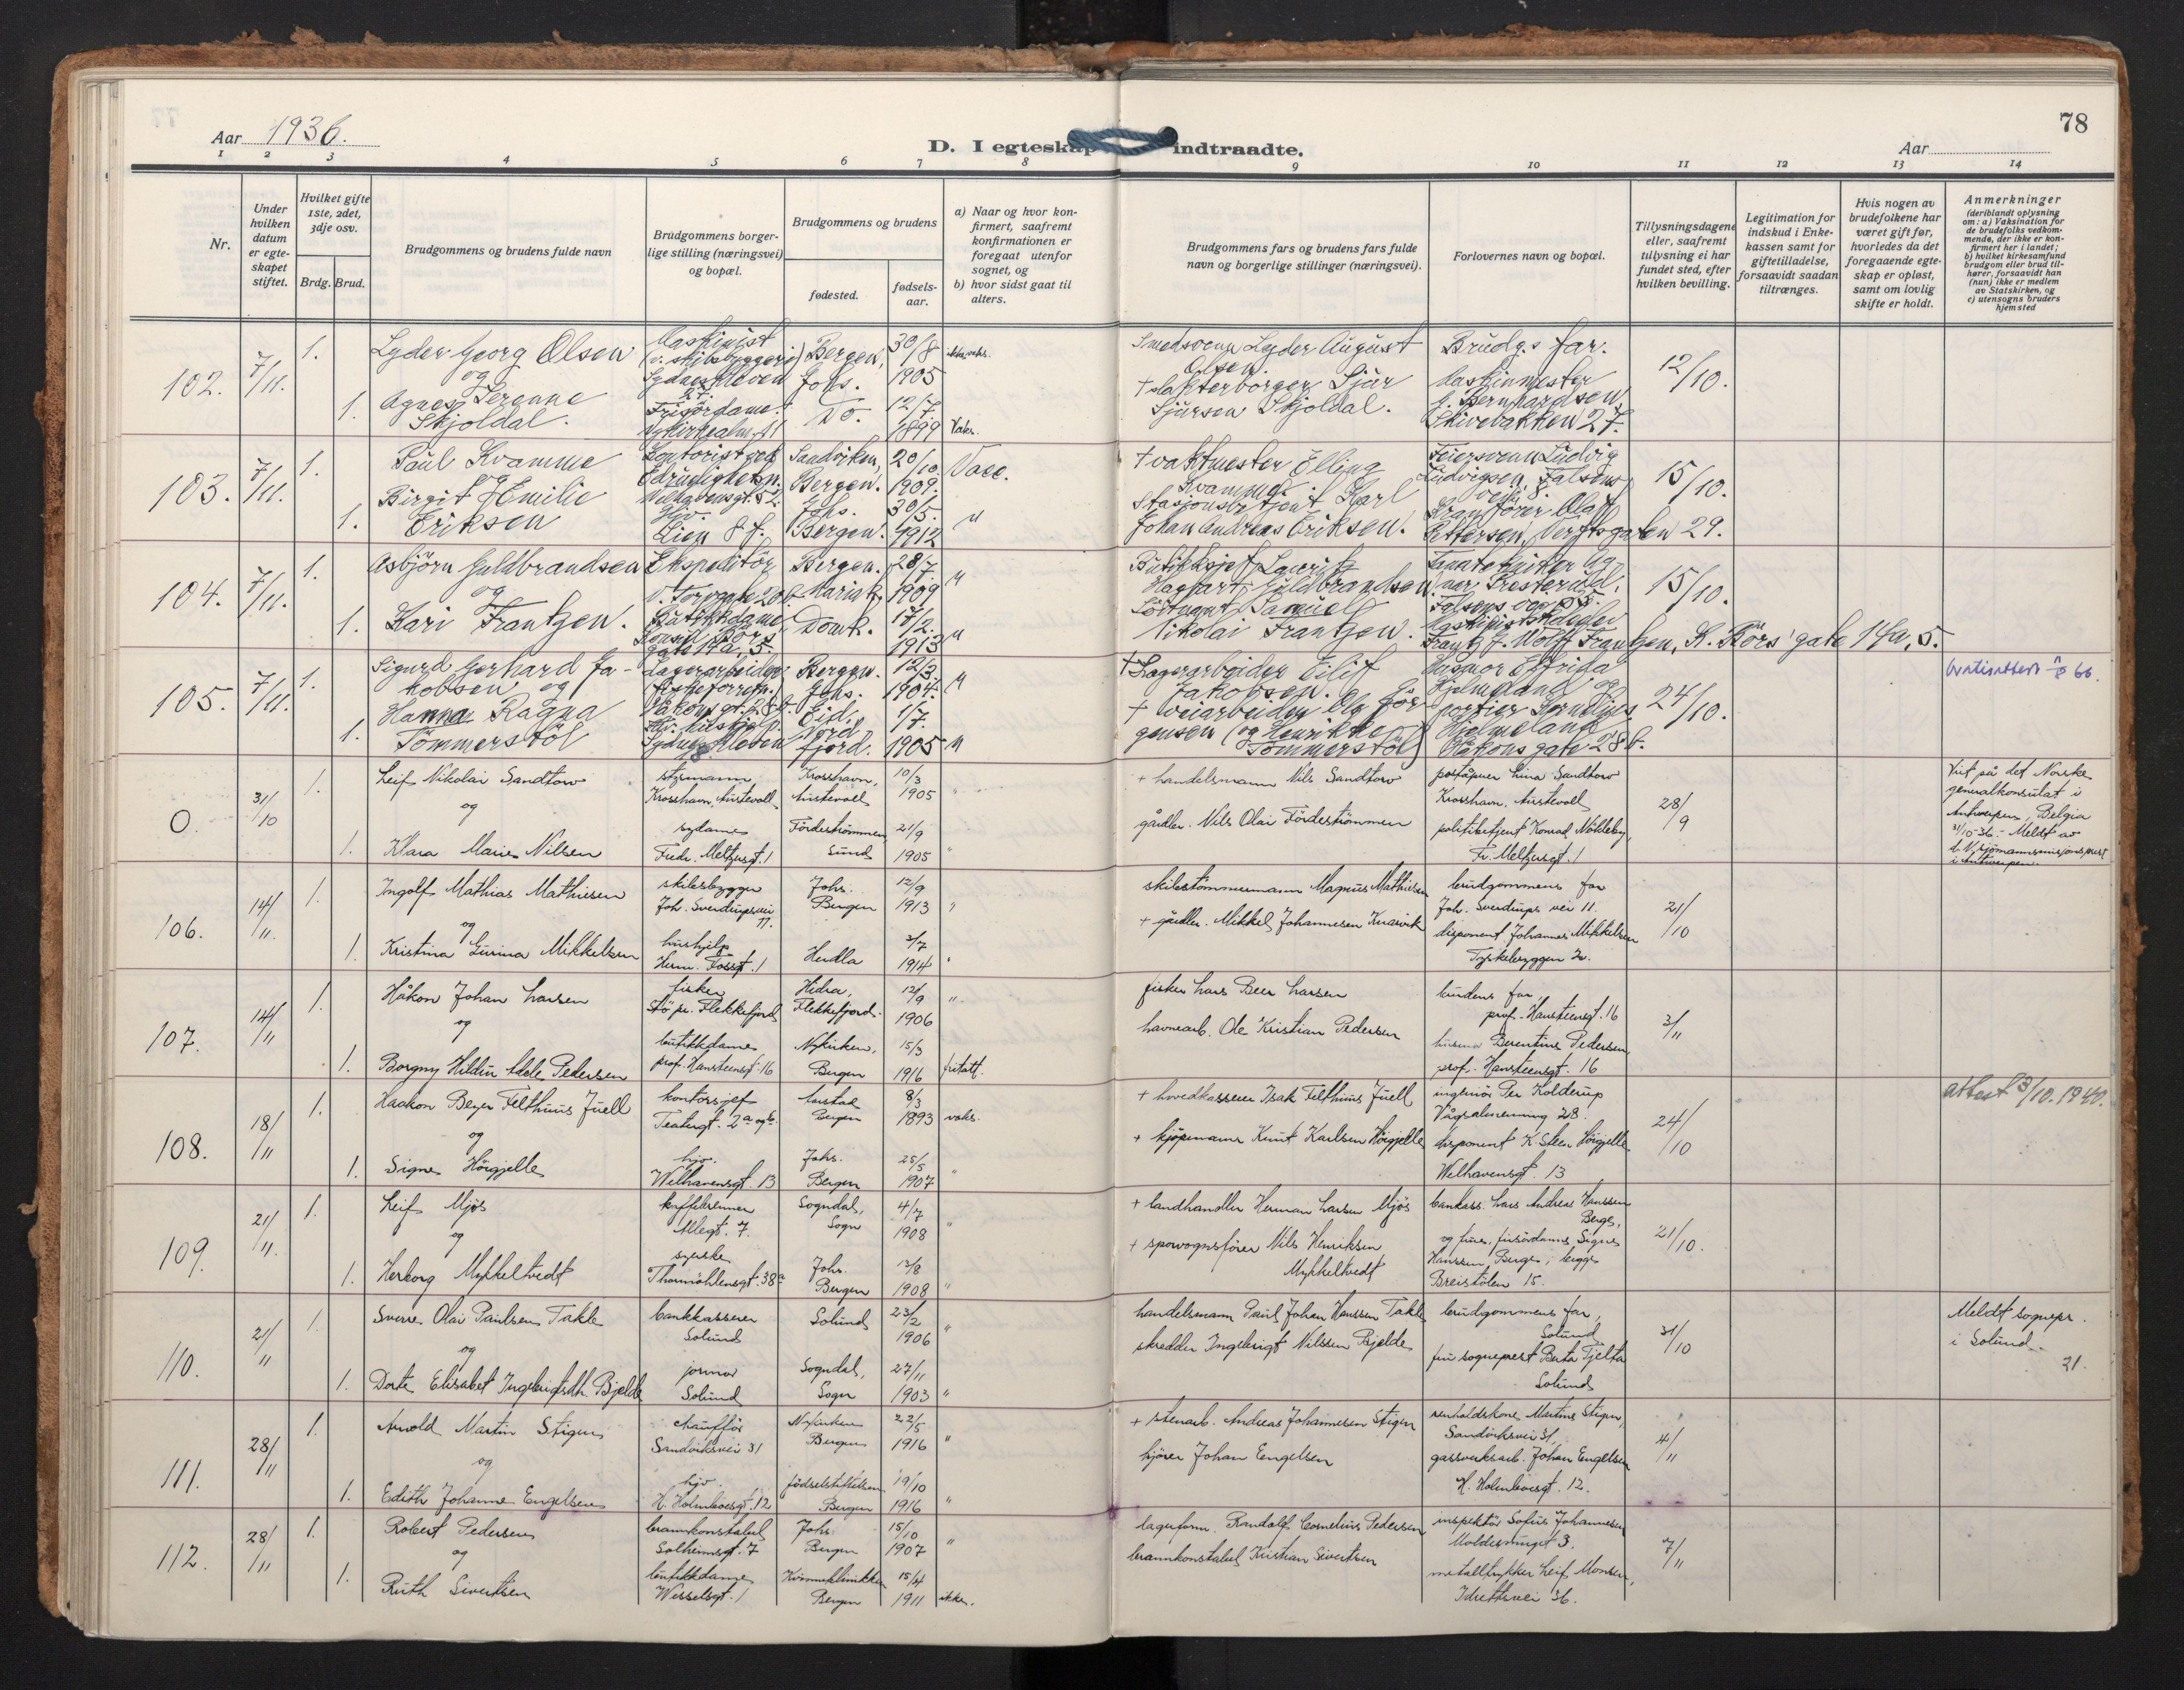 SAB, Johanneskirken Sokneprestembete, H/Haa/L0014: Ministerialbok nr. D 3, 1929-1949, s. 77b-78a